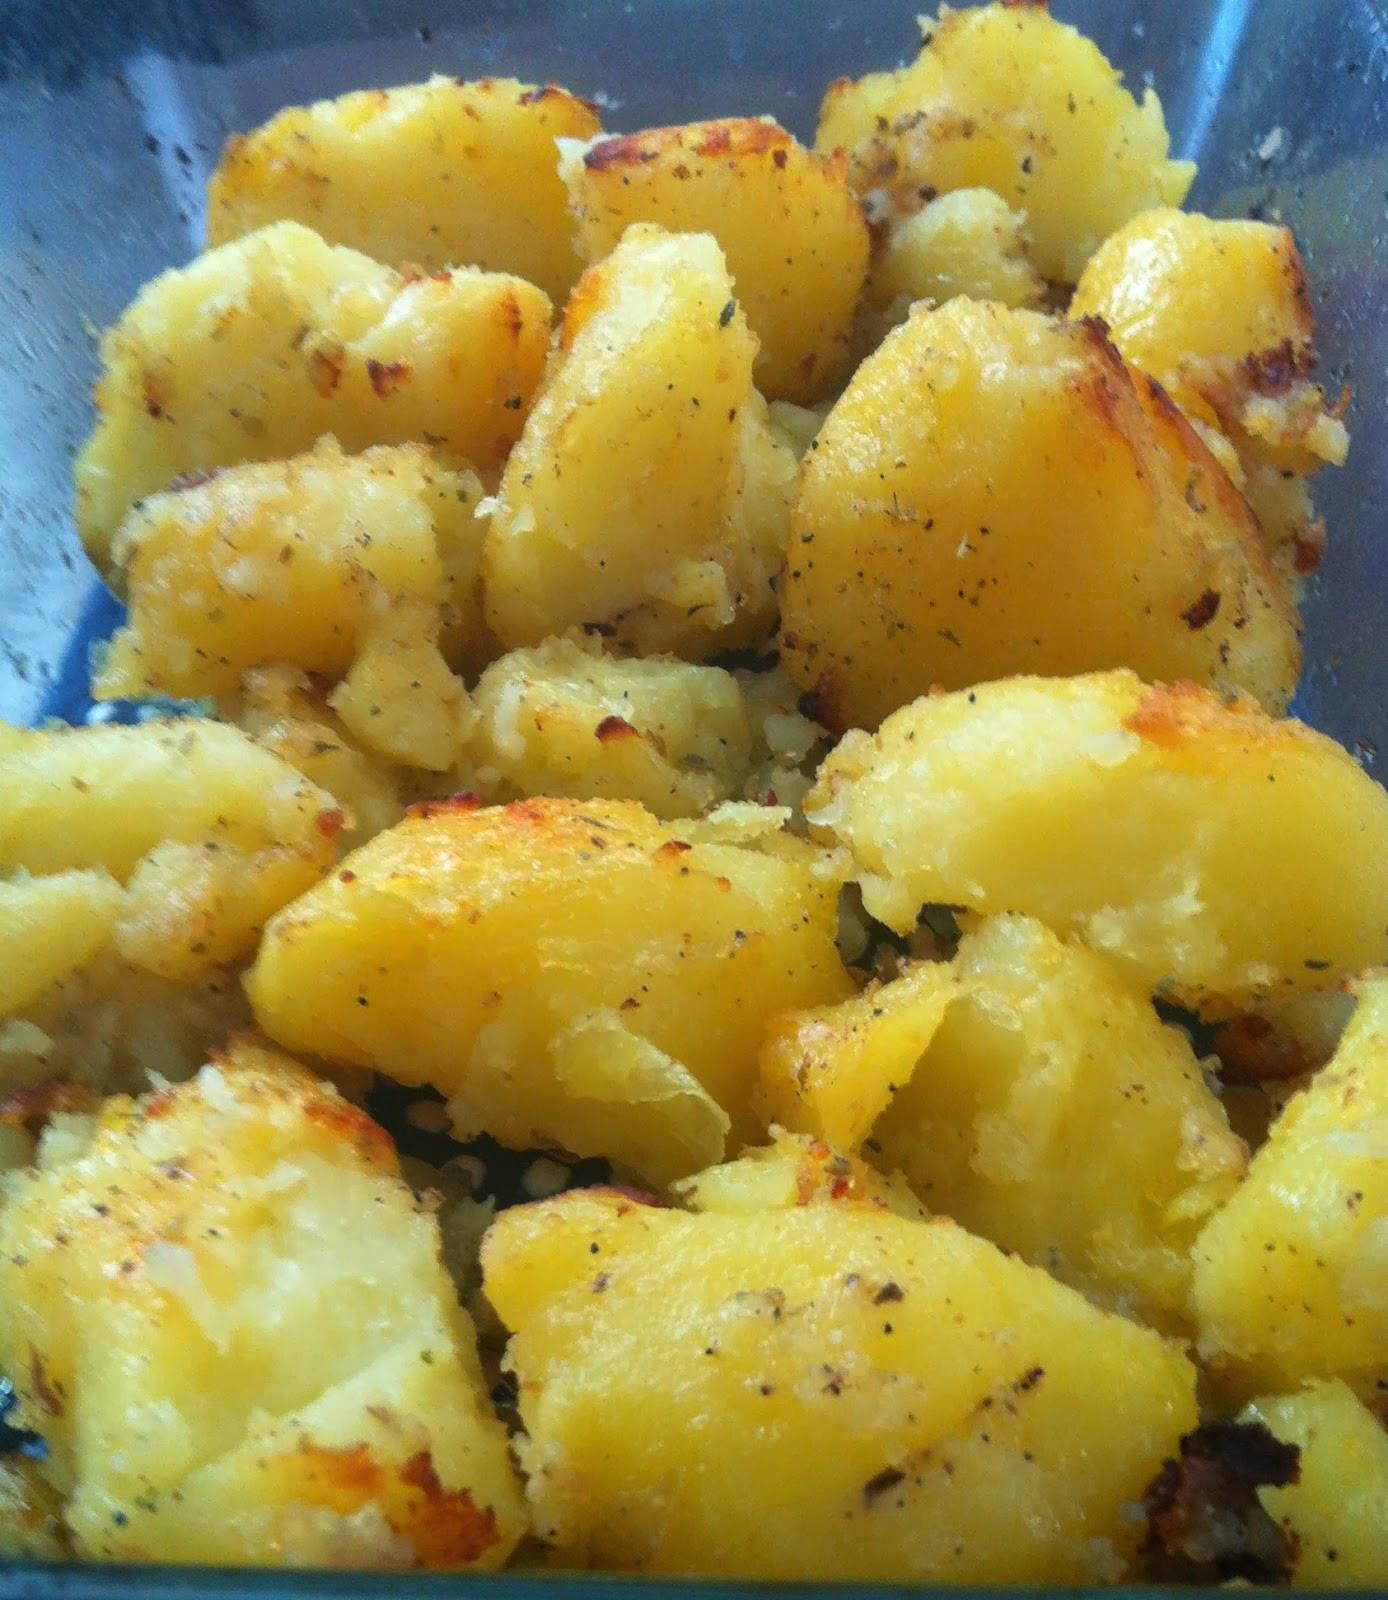 Roasted Yukon Gold Potatoes  Vegan Adjacent Roasted Gold Potatoes